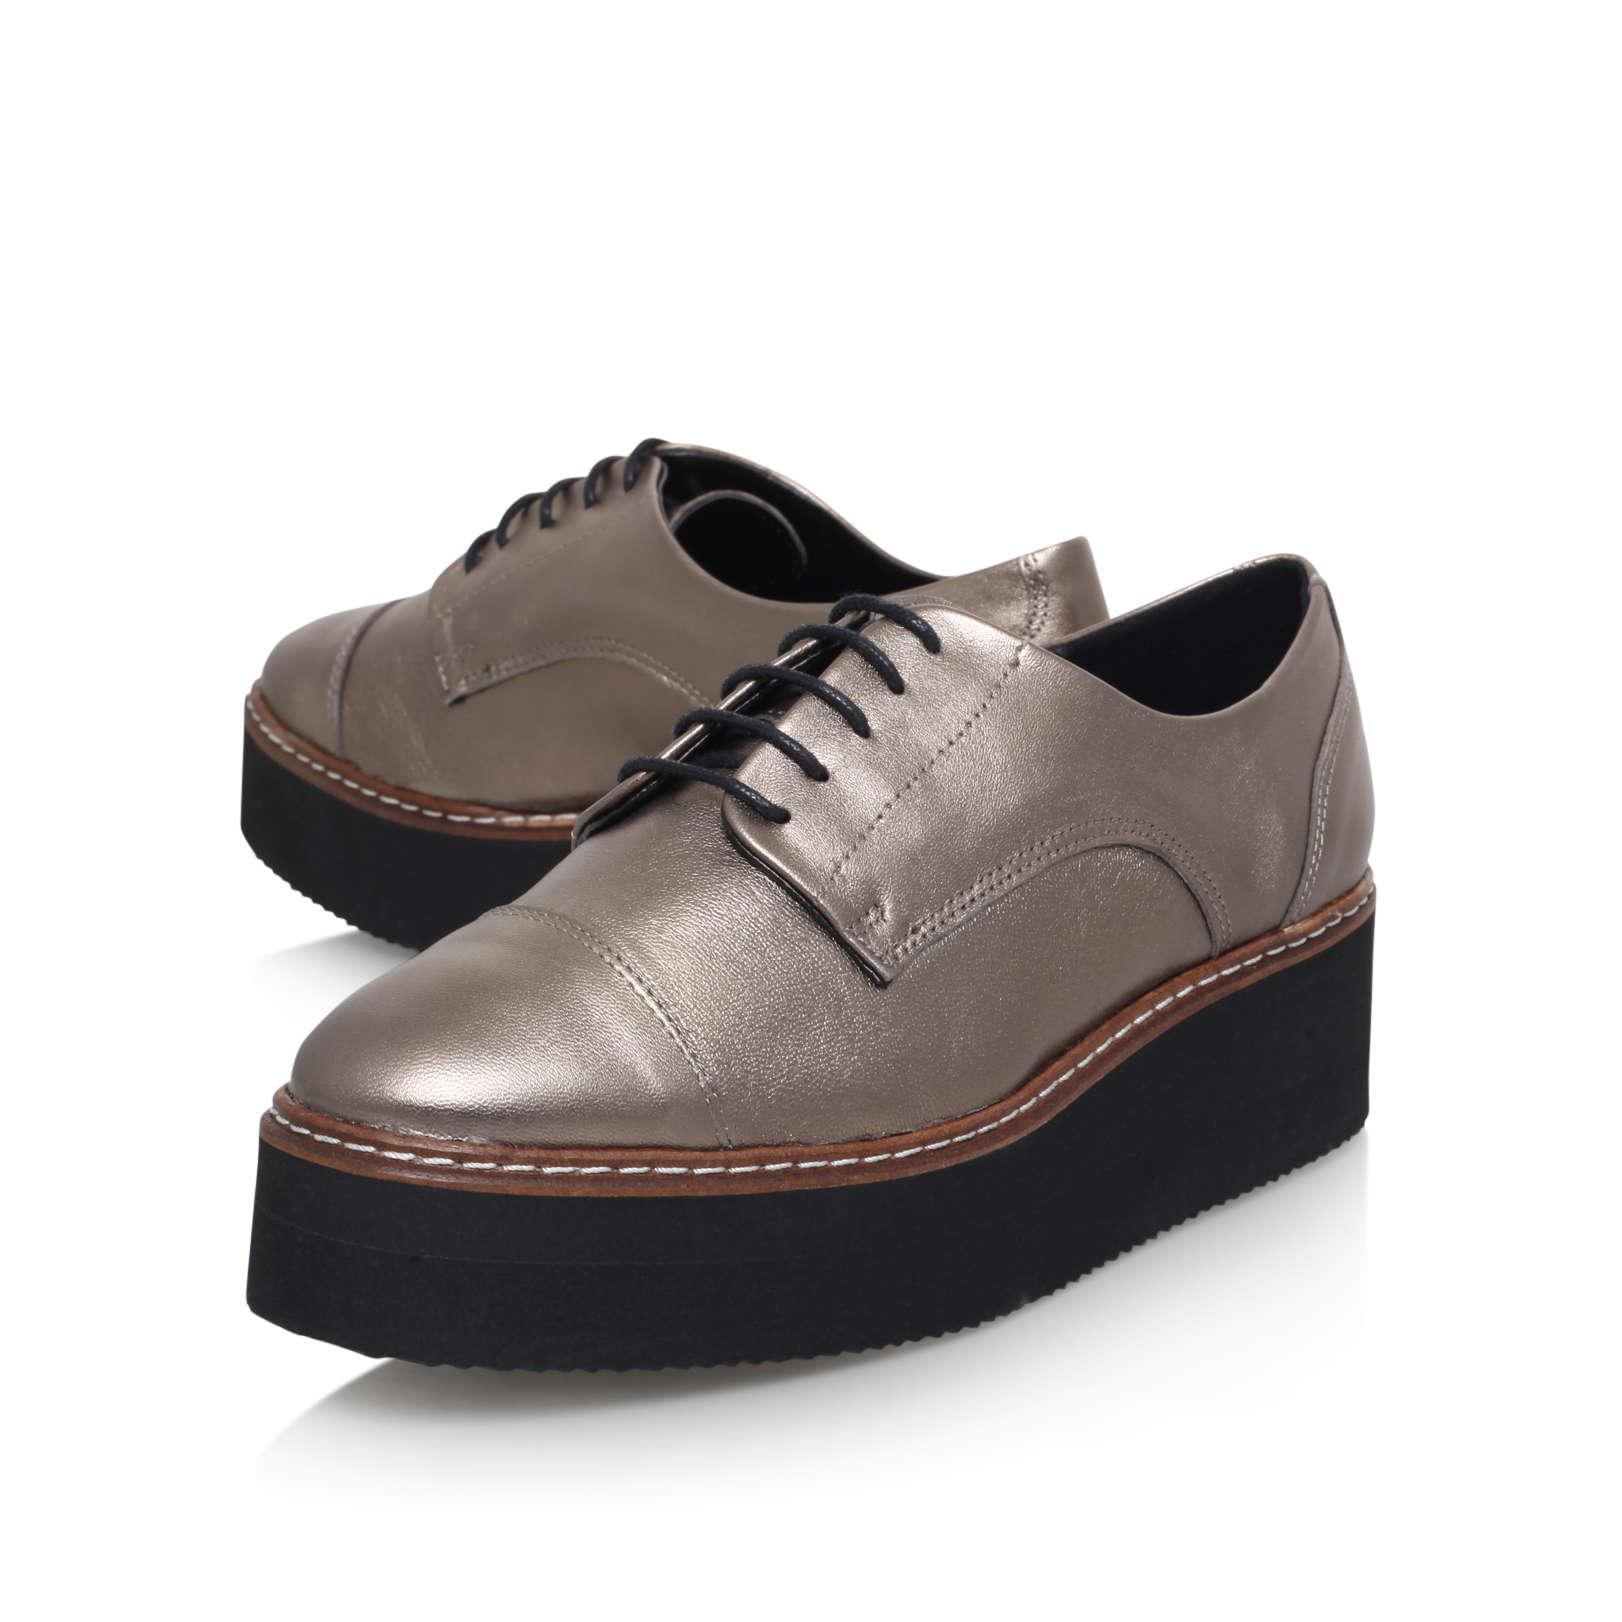 carvela kurt geiger bronze leather flat formal